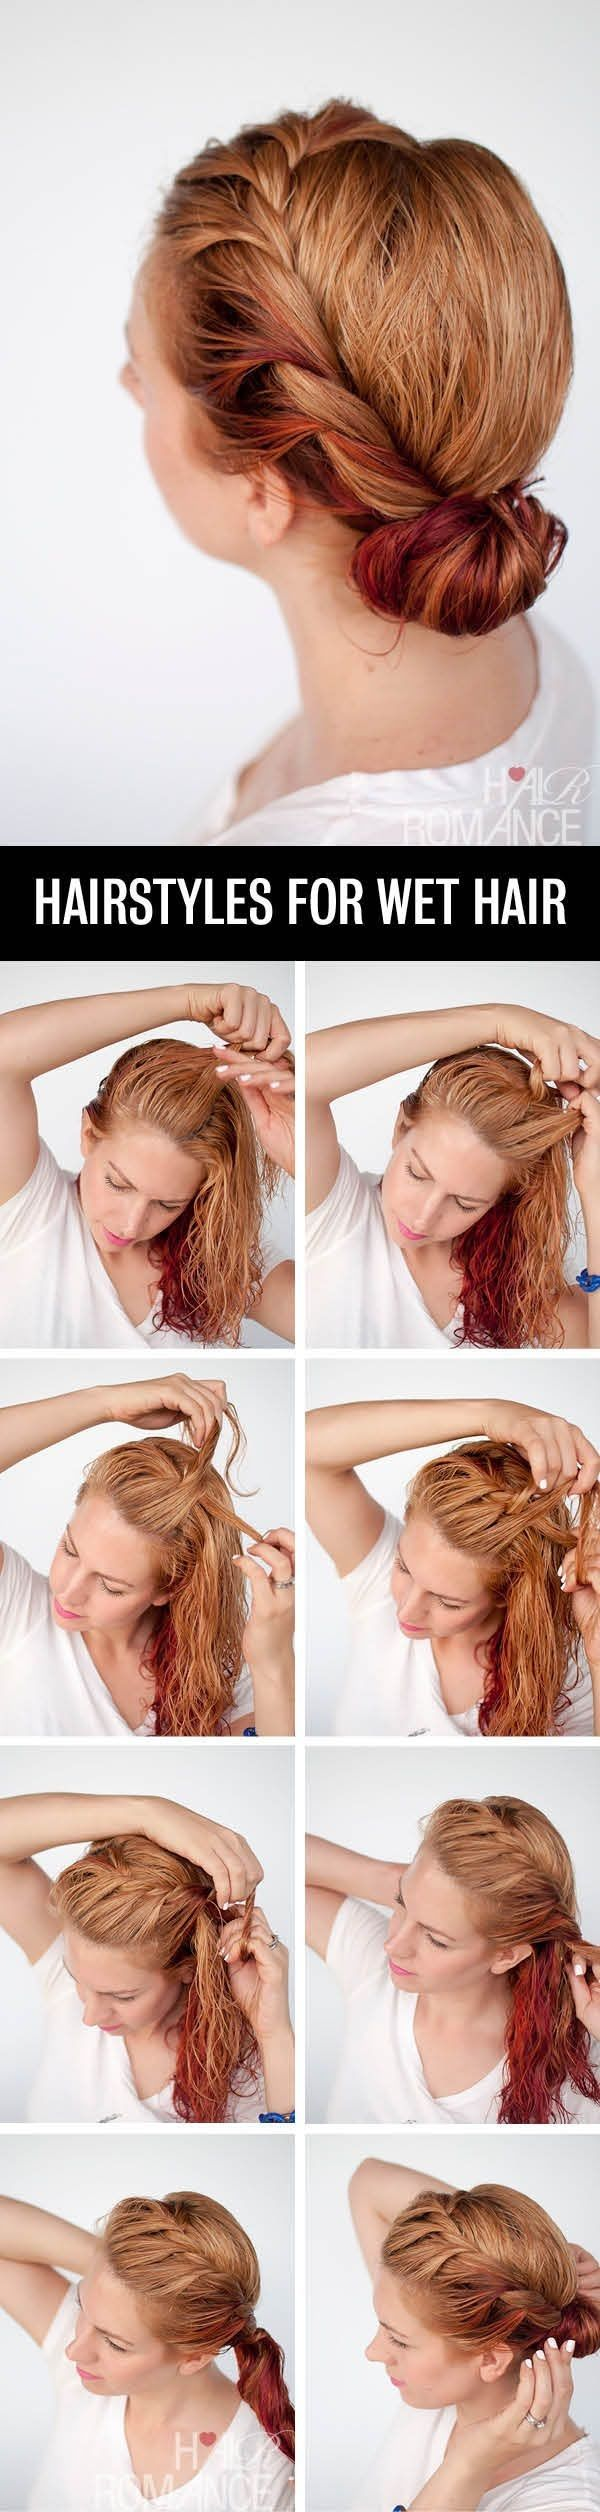 Wondrous 1000 Ideas About Wet Hair Hairstyles On Pinterest Wet Hair Hairstyles For Men Maxibearus